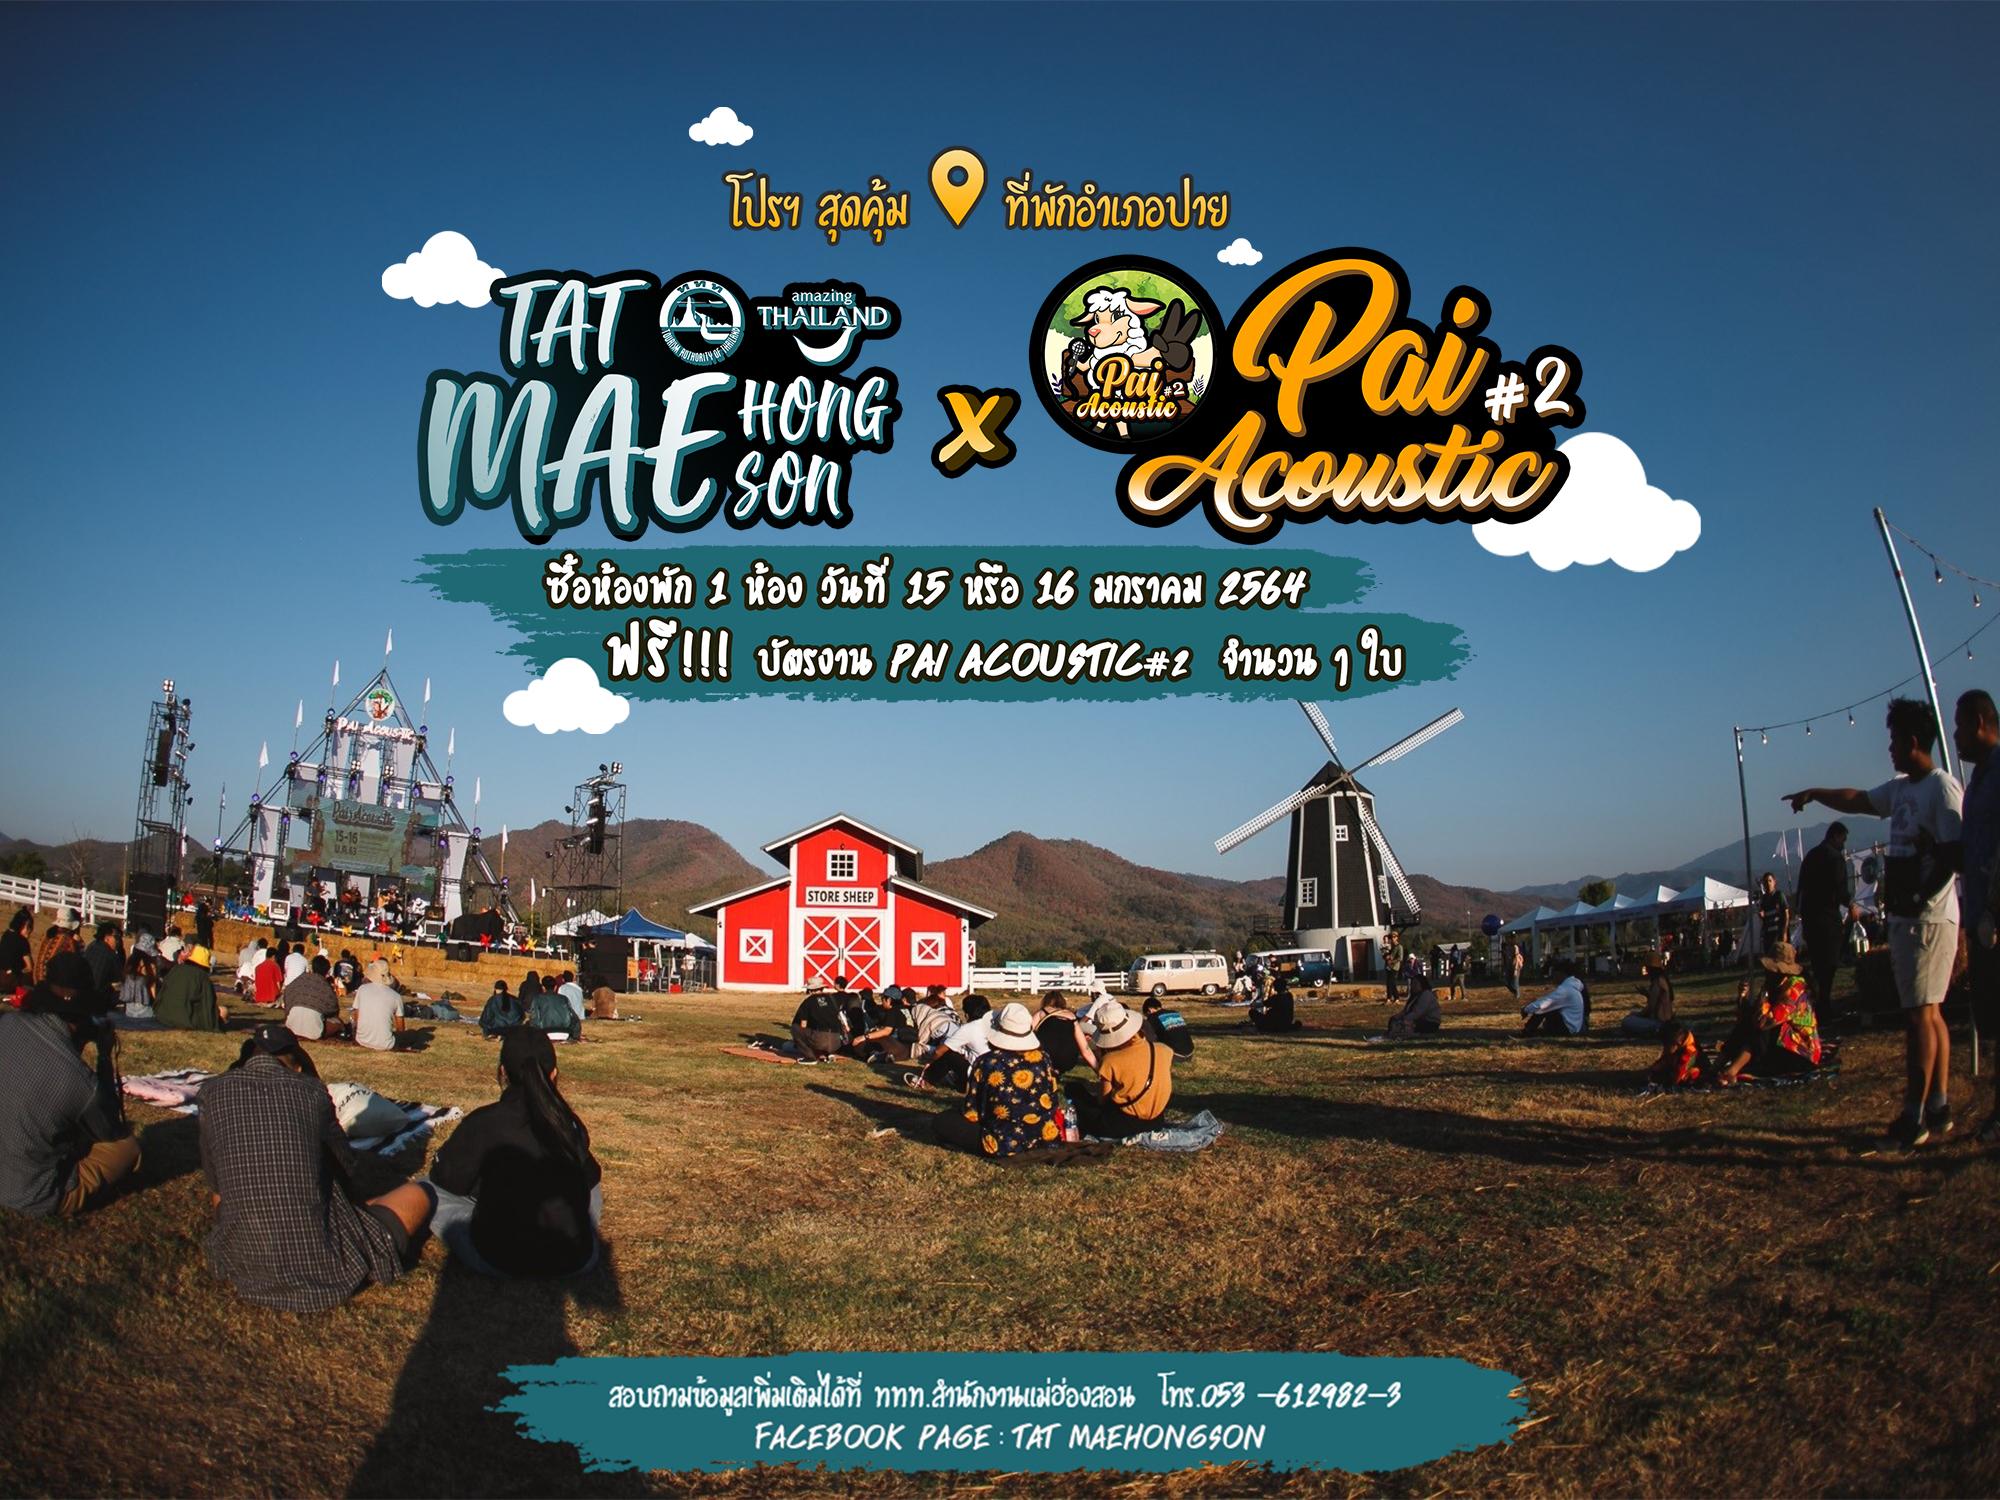 Pai Acoustic#2 คอนเสิร์ตสุดชิล ที่พักถูกใจ